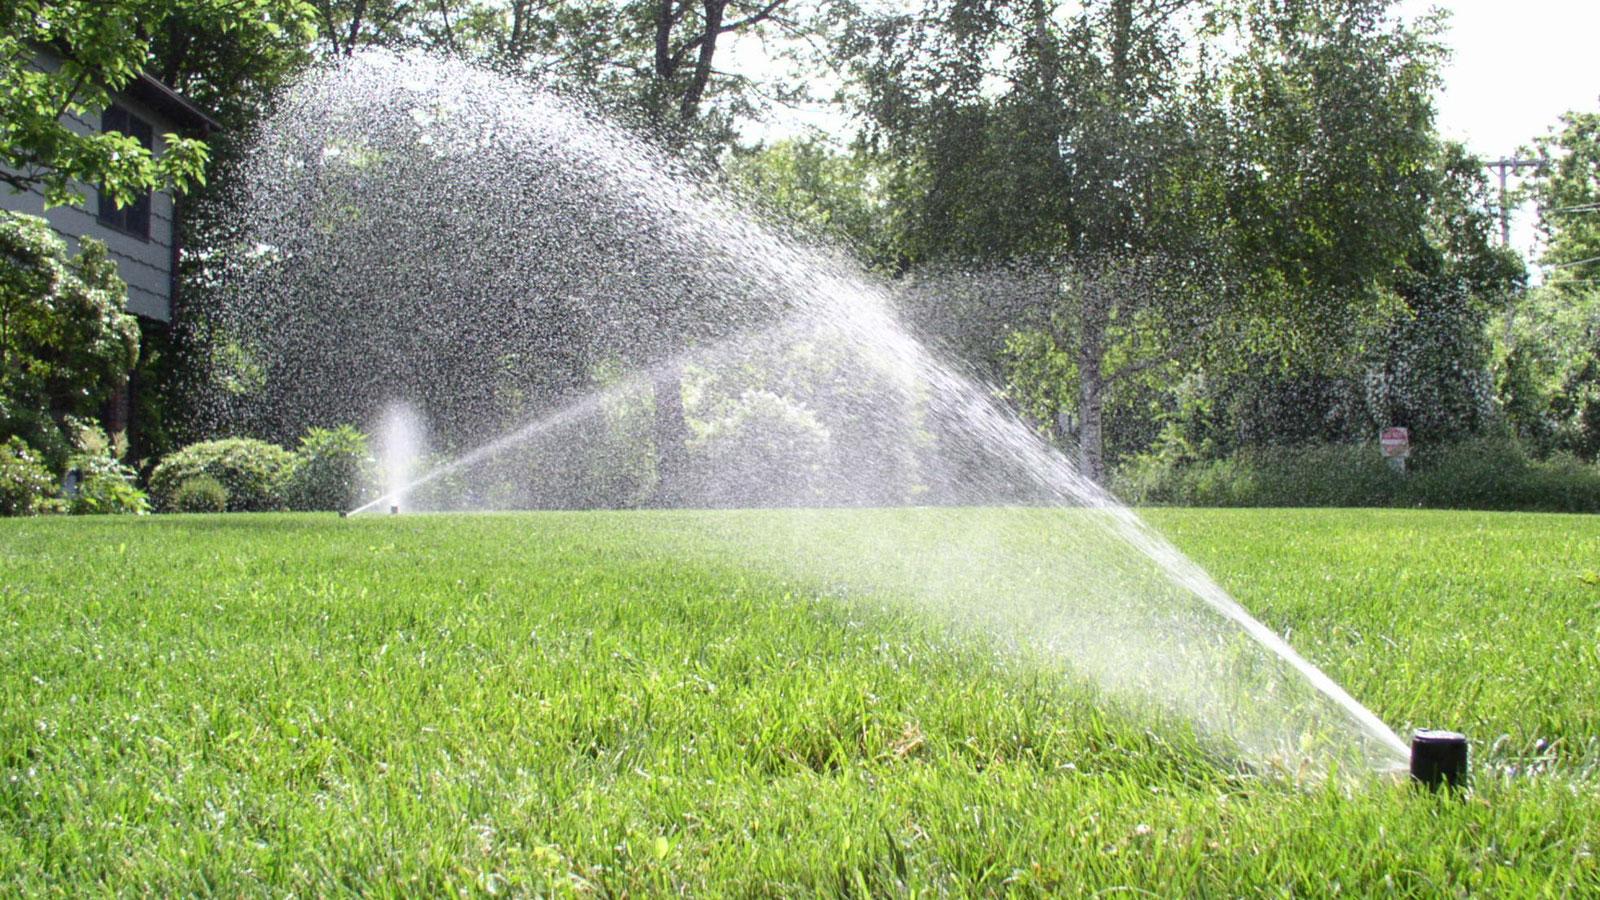 Irrigation Gordon Eadie Landscape Design Main Line PA 1600x900